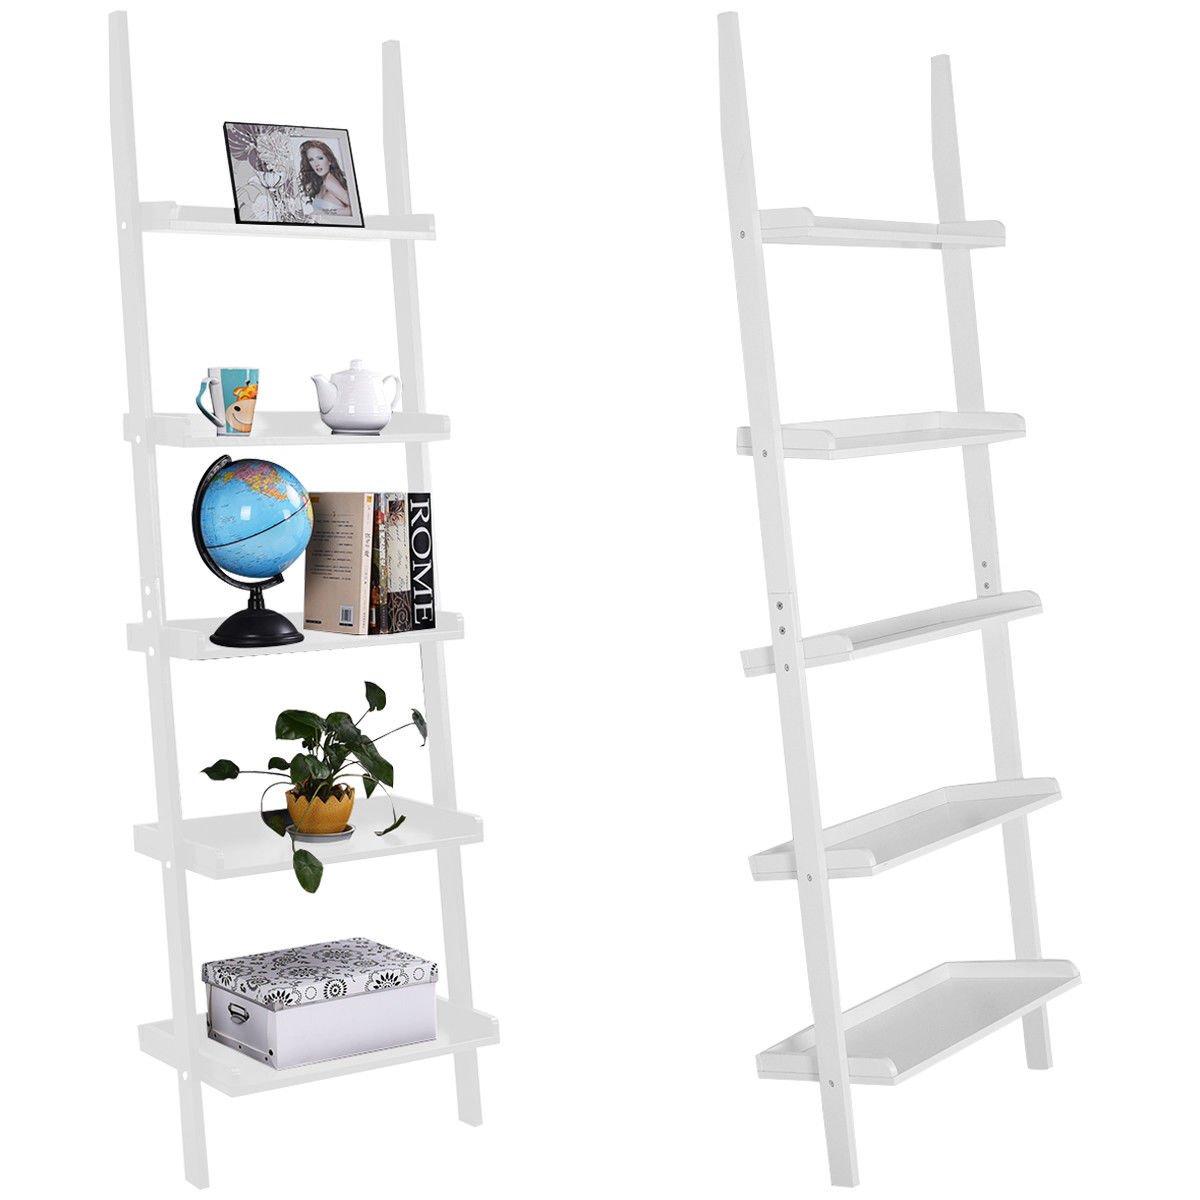 TANGKULA Ladder Bookcase 5-Tire Wood Leaning Shelf Wall Plant Shelf Ladder Home Office Modern Flower Book Display Shelf Storage Rack Stable A-Frame Wooden Ladder Shelf (Black) AM0769HM